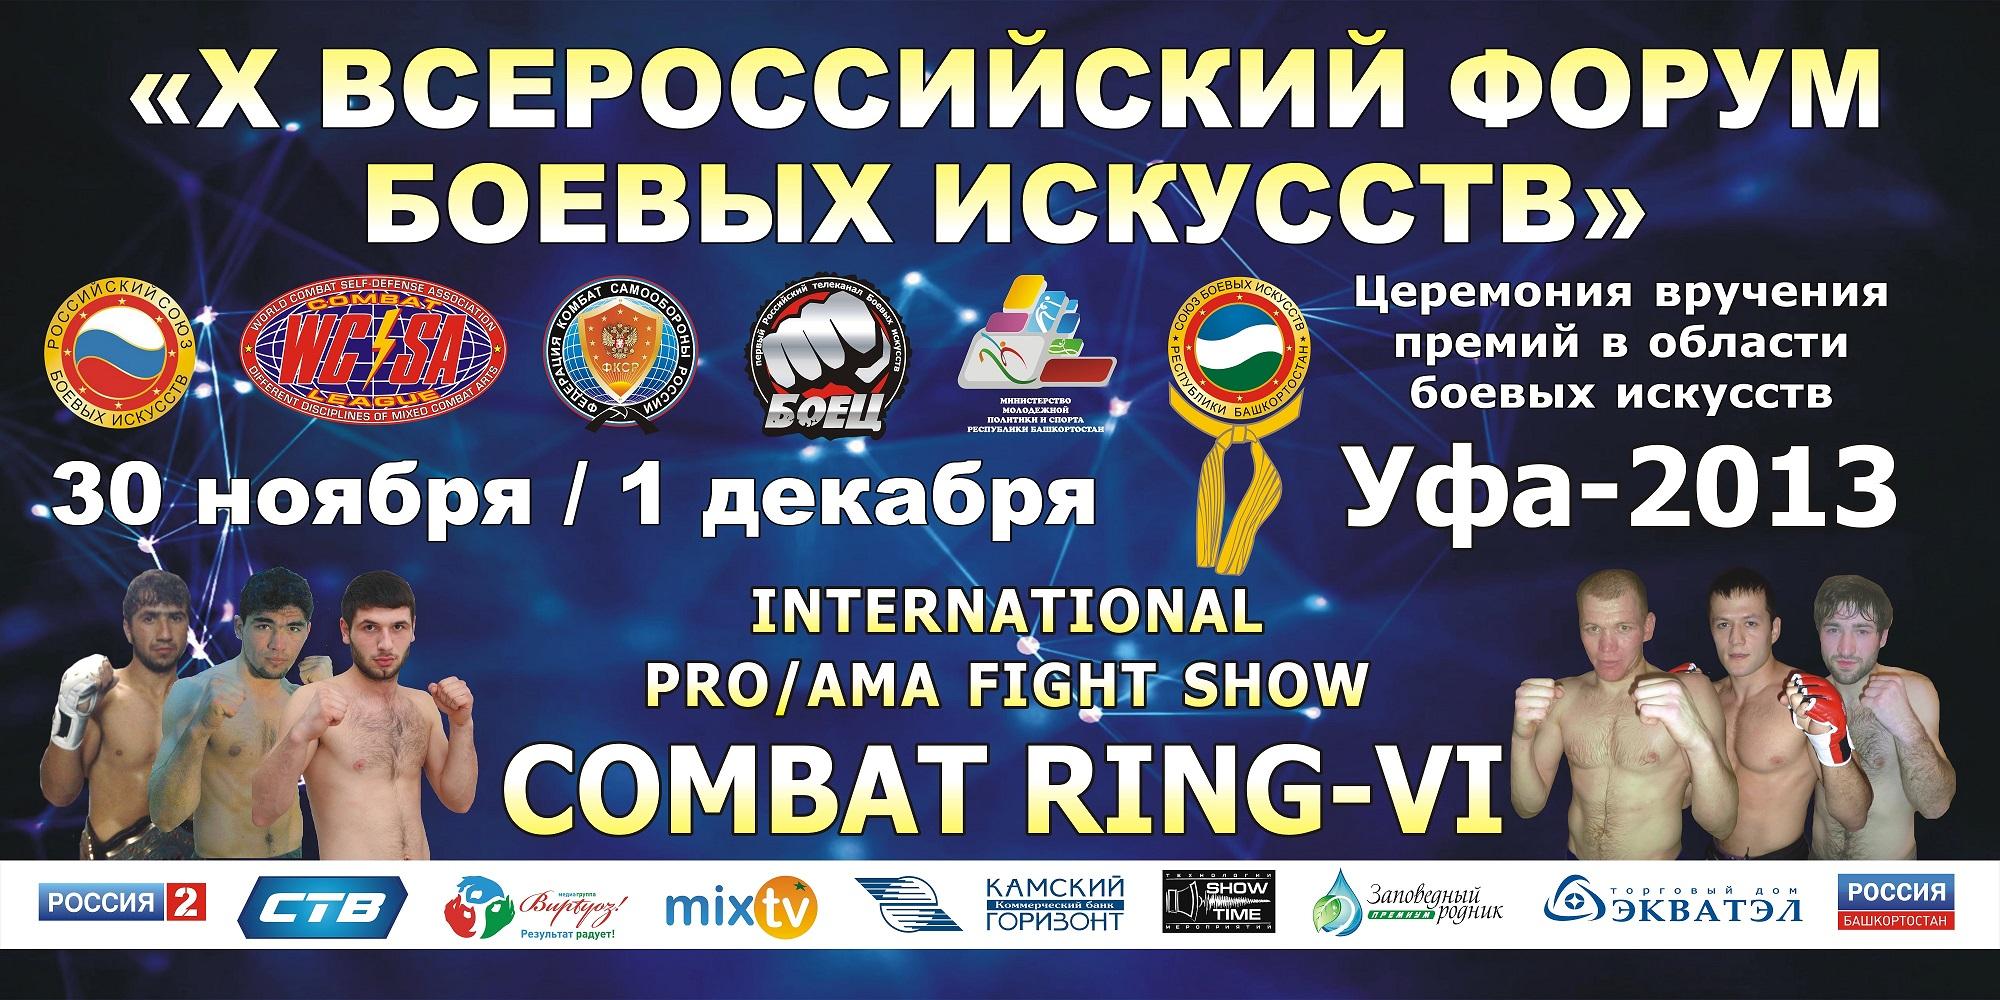 http://www.combatsd.ru/images/upload/Баннер...jpg